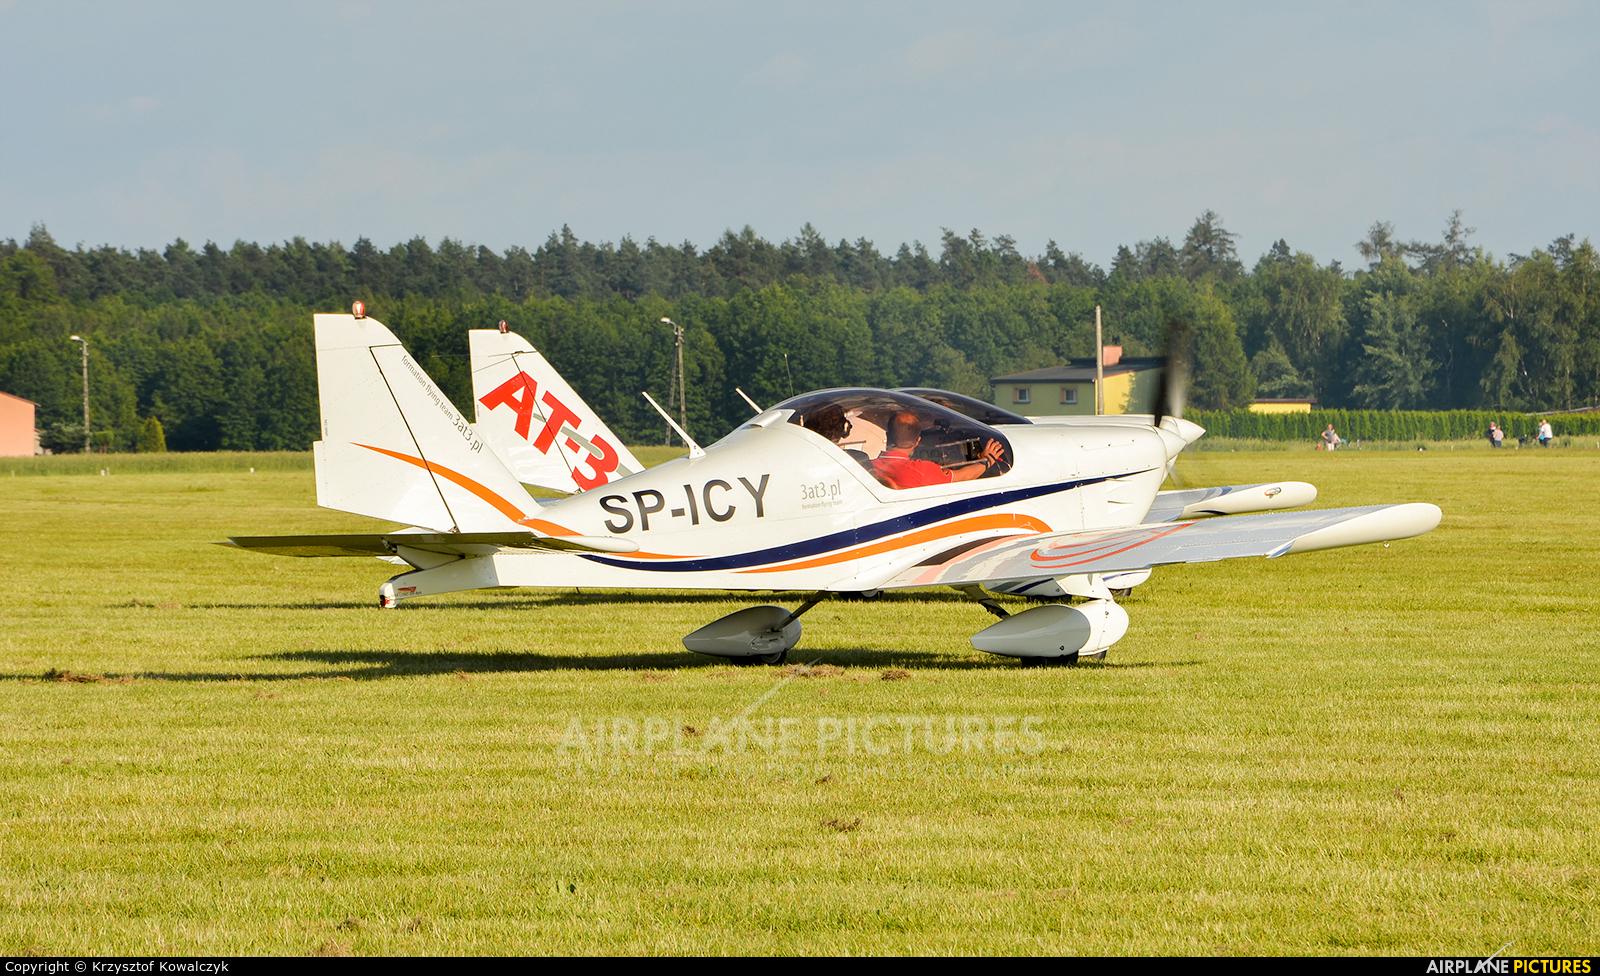 3AT3 Formation Flying Team SP-ICY aircraft at Rybnik - Gotartowice